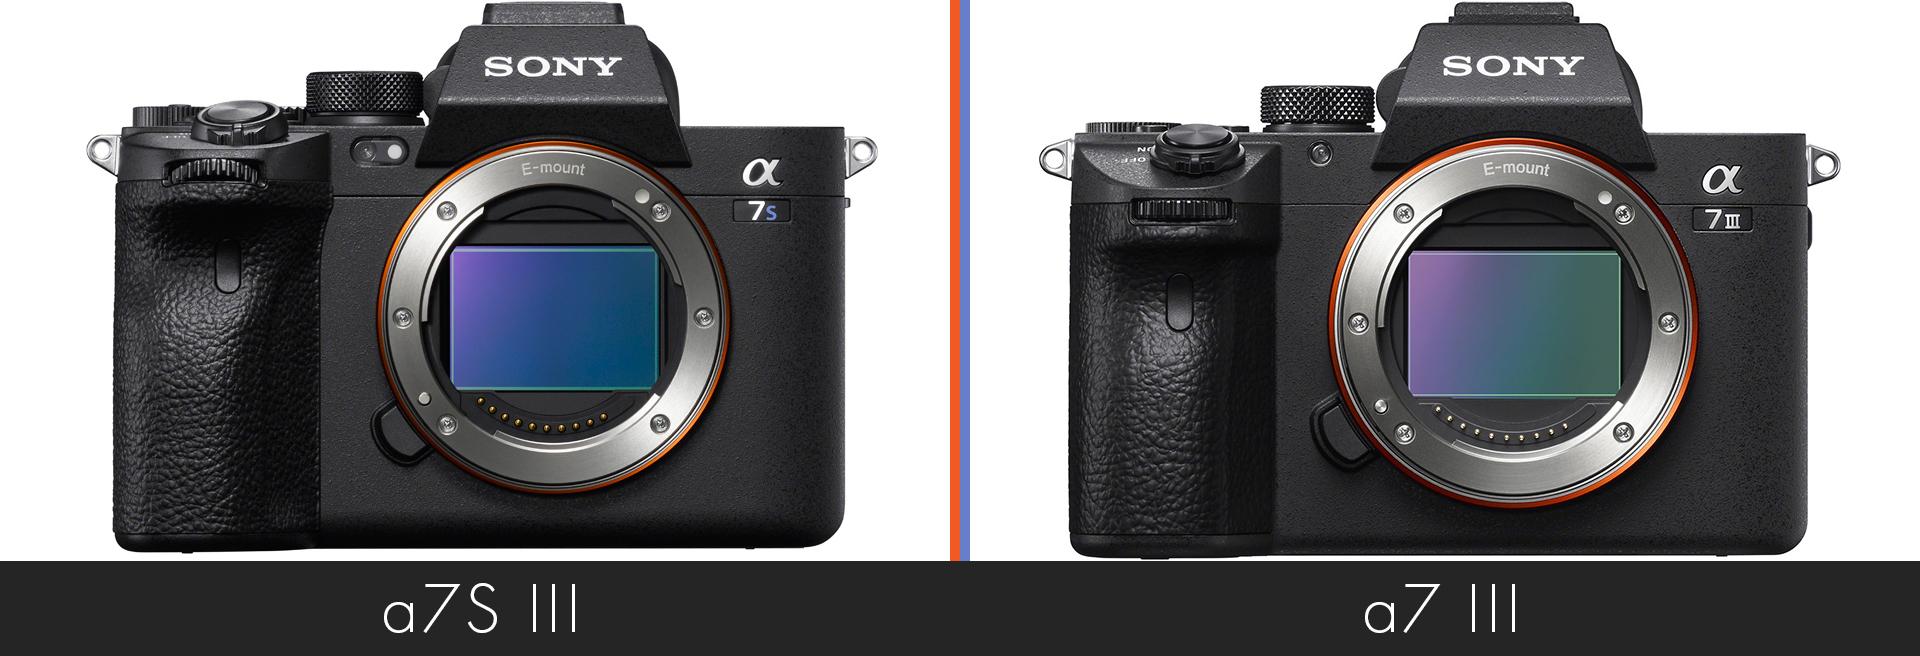 a7S III versus Sony a7 III